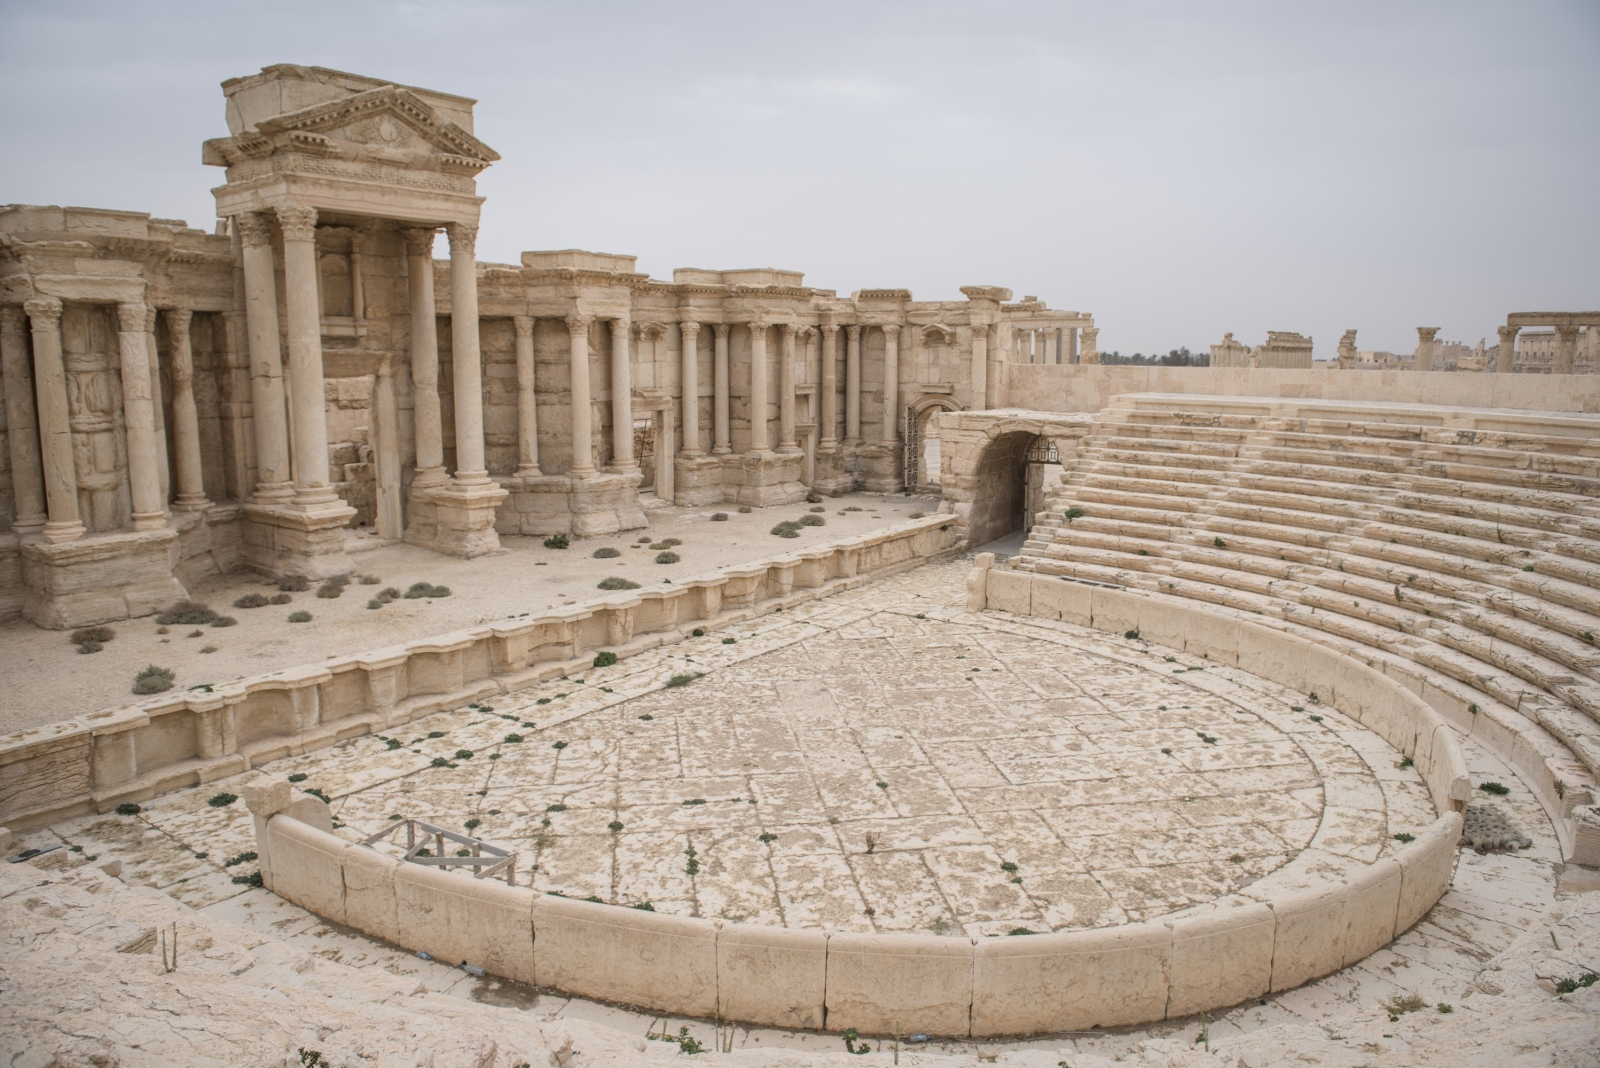 Art and Documentary Photography - Loading Cio___che_resta_di_Palmyra_24.jpg